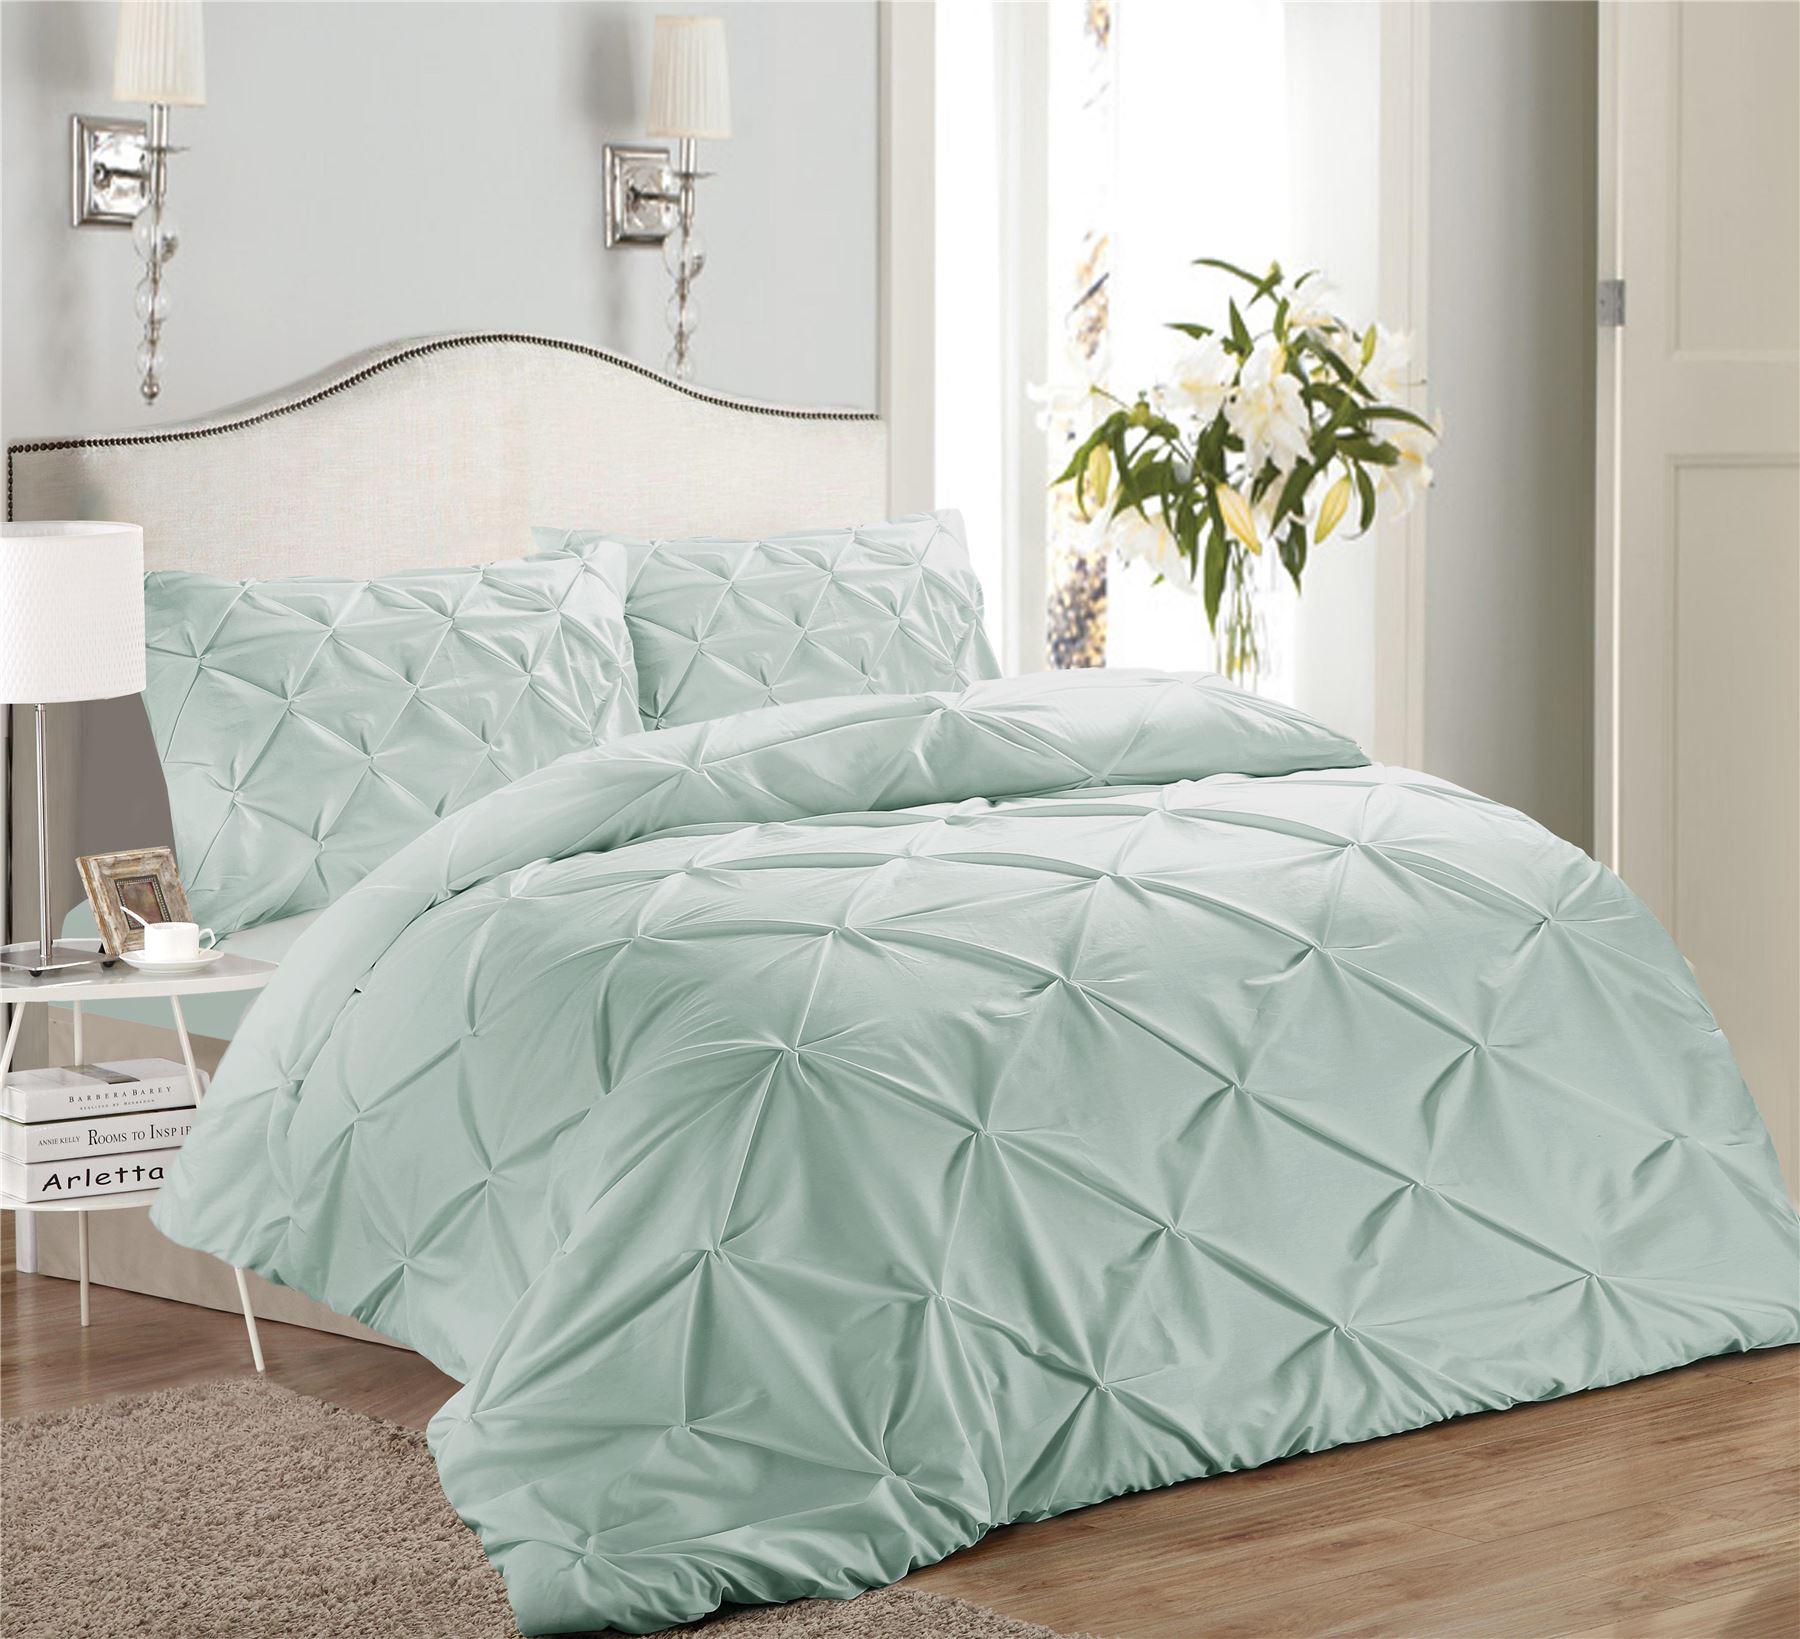 Luxury-Pure-100-Cotton-200-Thread-Pinch-Pleat-Pintuck-Puckering-Duvet-Cover-Set thumbnail 15